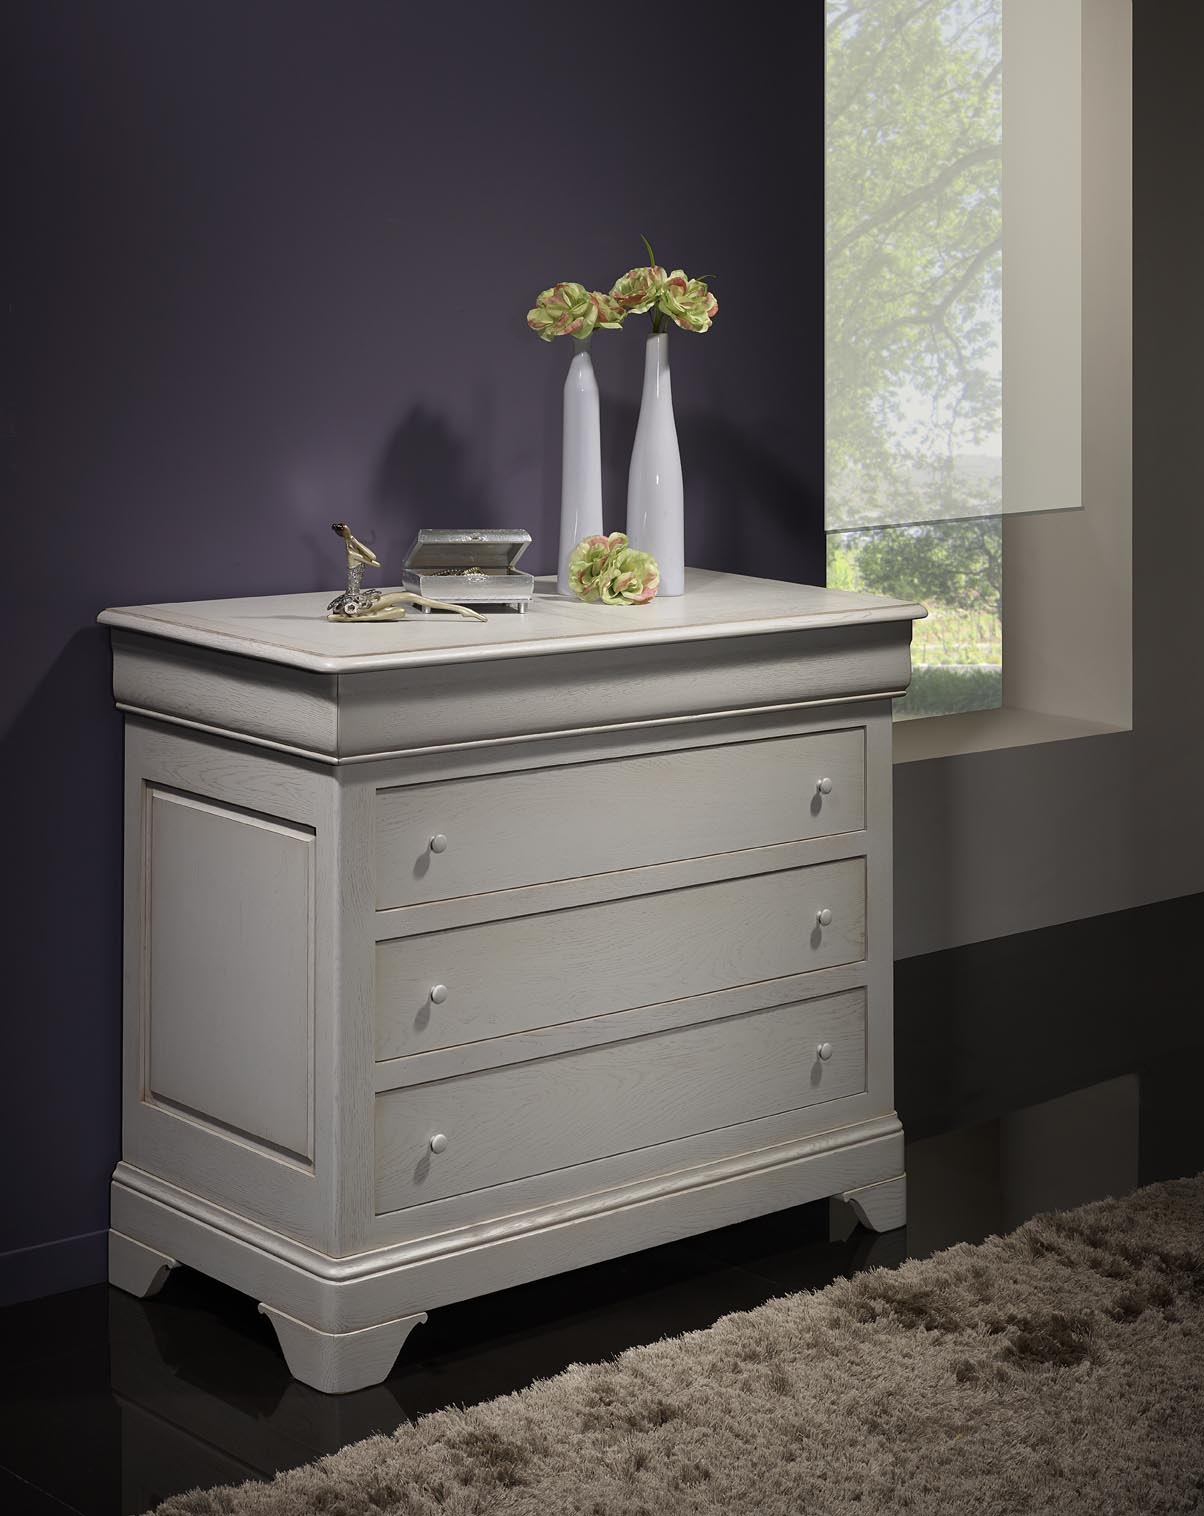 commode 4 tiroirs en ch ne massif de style louis philippe finition ch ne bross gris perle. Black Bedroom Furniture Sets. Home Design Ideas